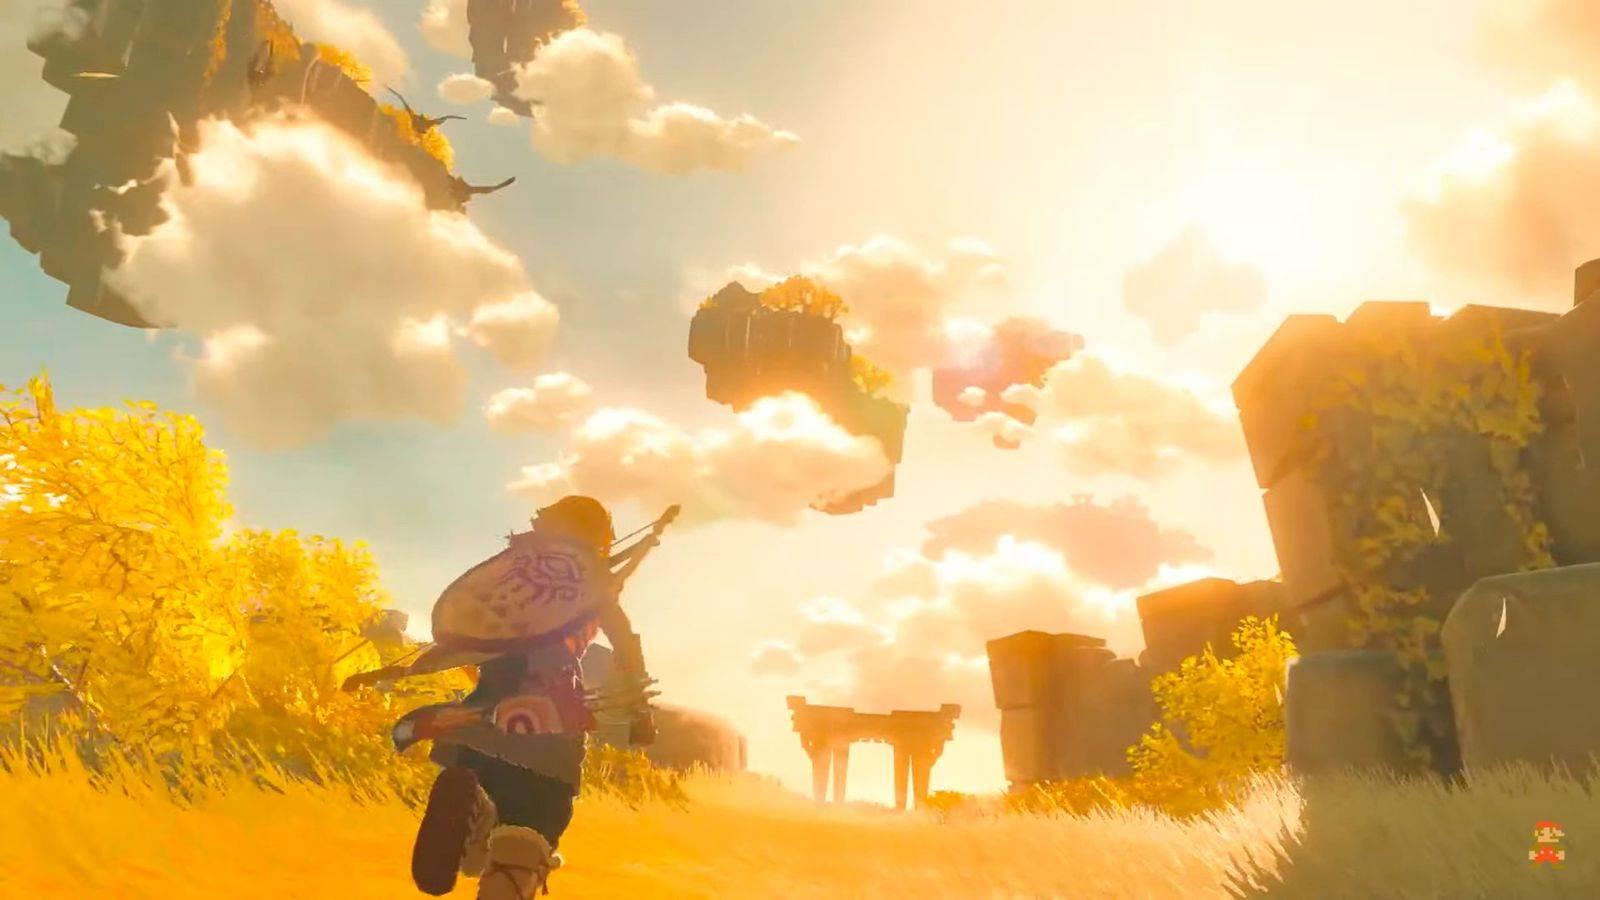 E3 2021: Se muestra un nuevo avance de The Legend of Zelda Breath of the Wild 2 1